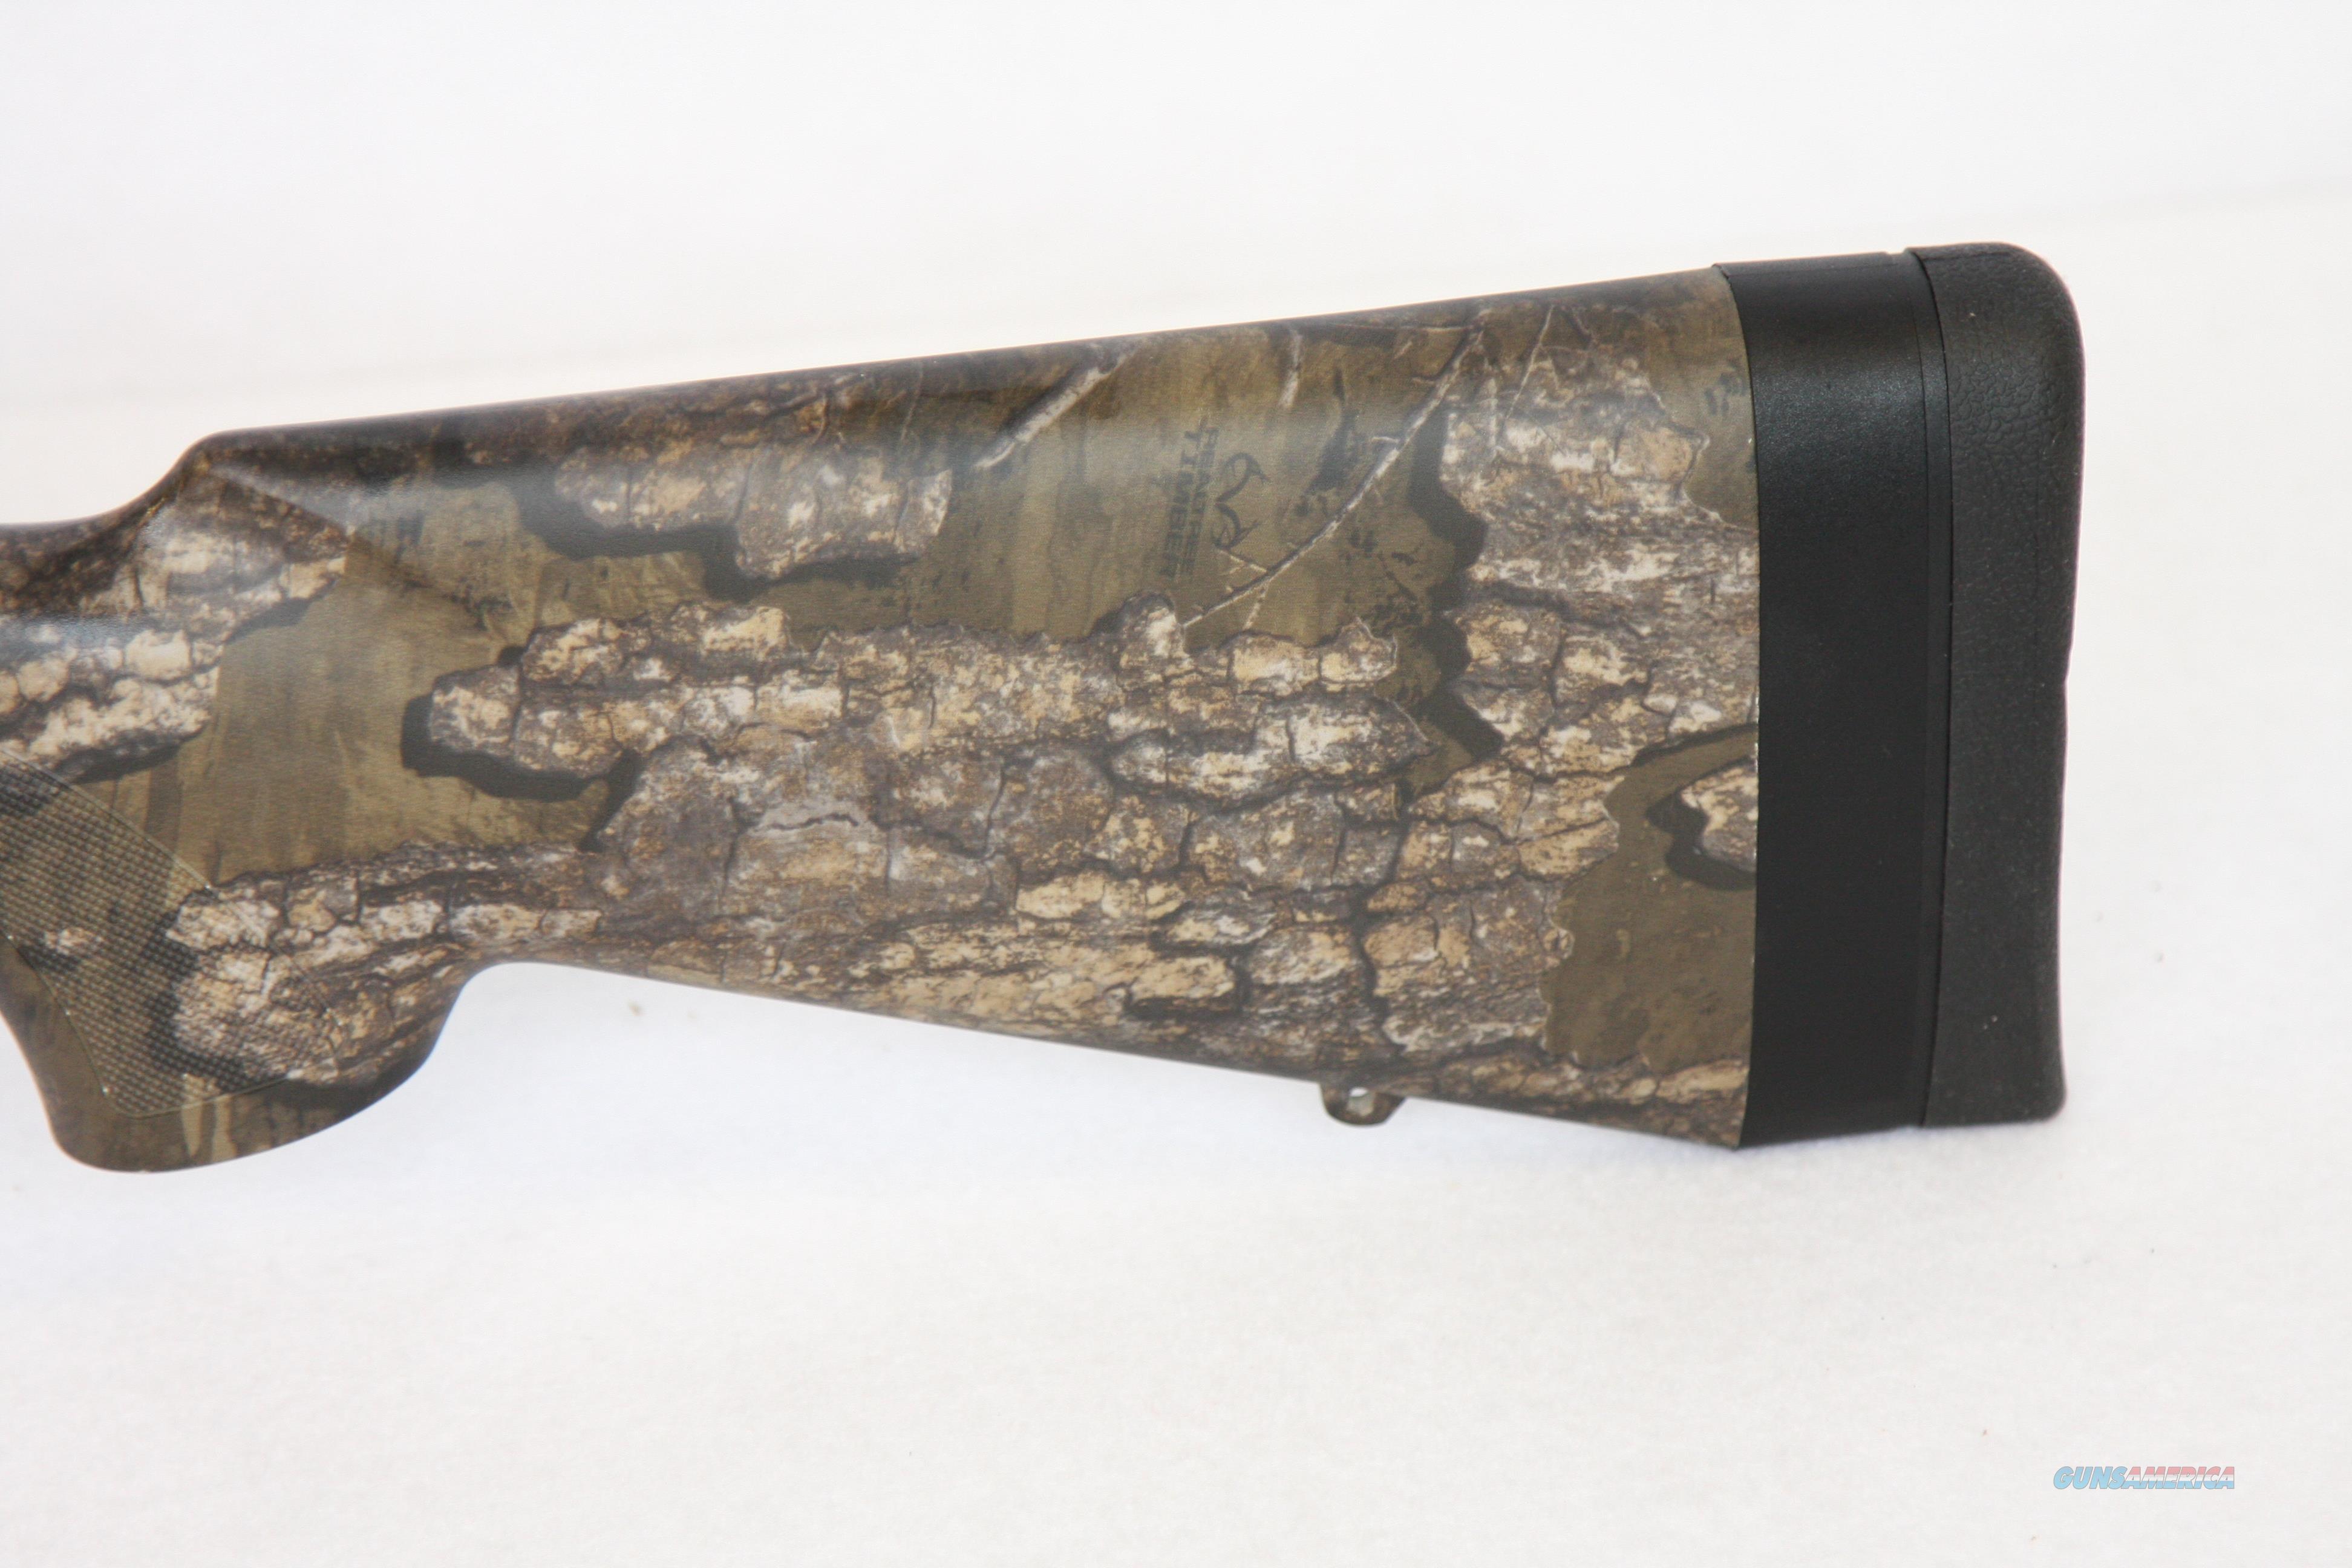 Beretta A300 Outlander 12g 28in Realtree Timber  Guns > Shotguns > Beretta Shotguns > Autoloaders > Hunting